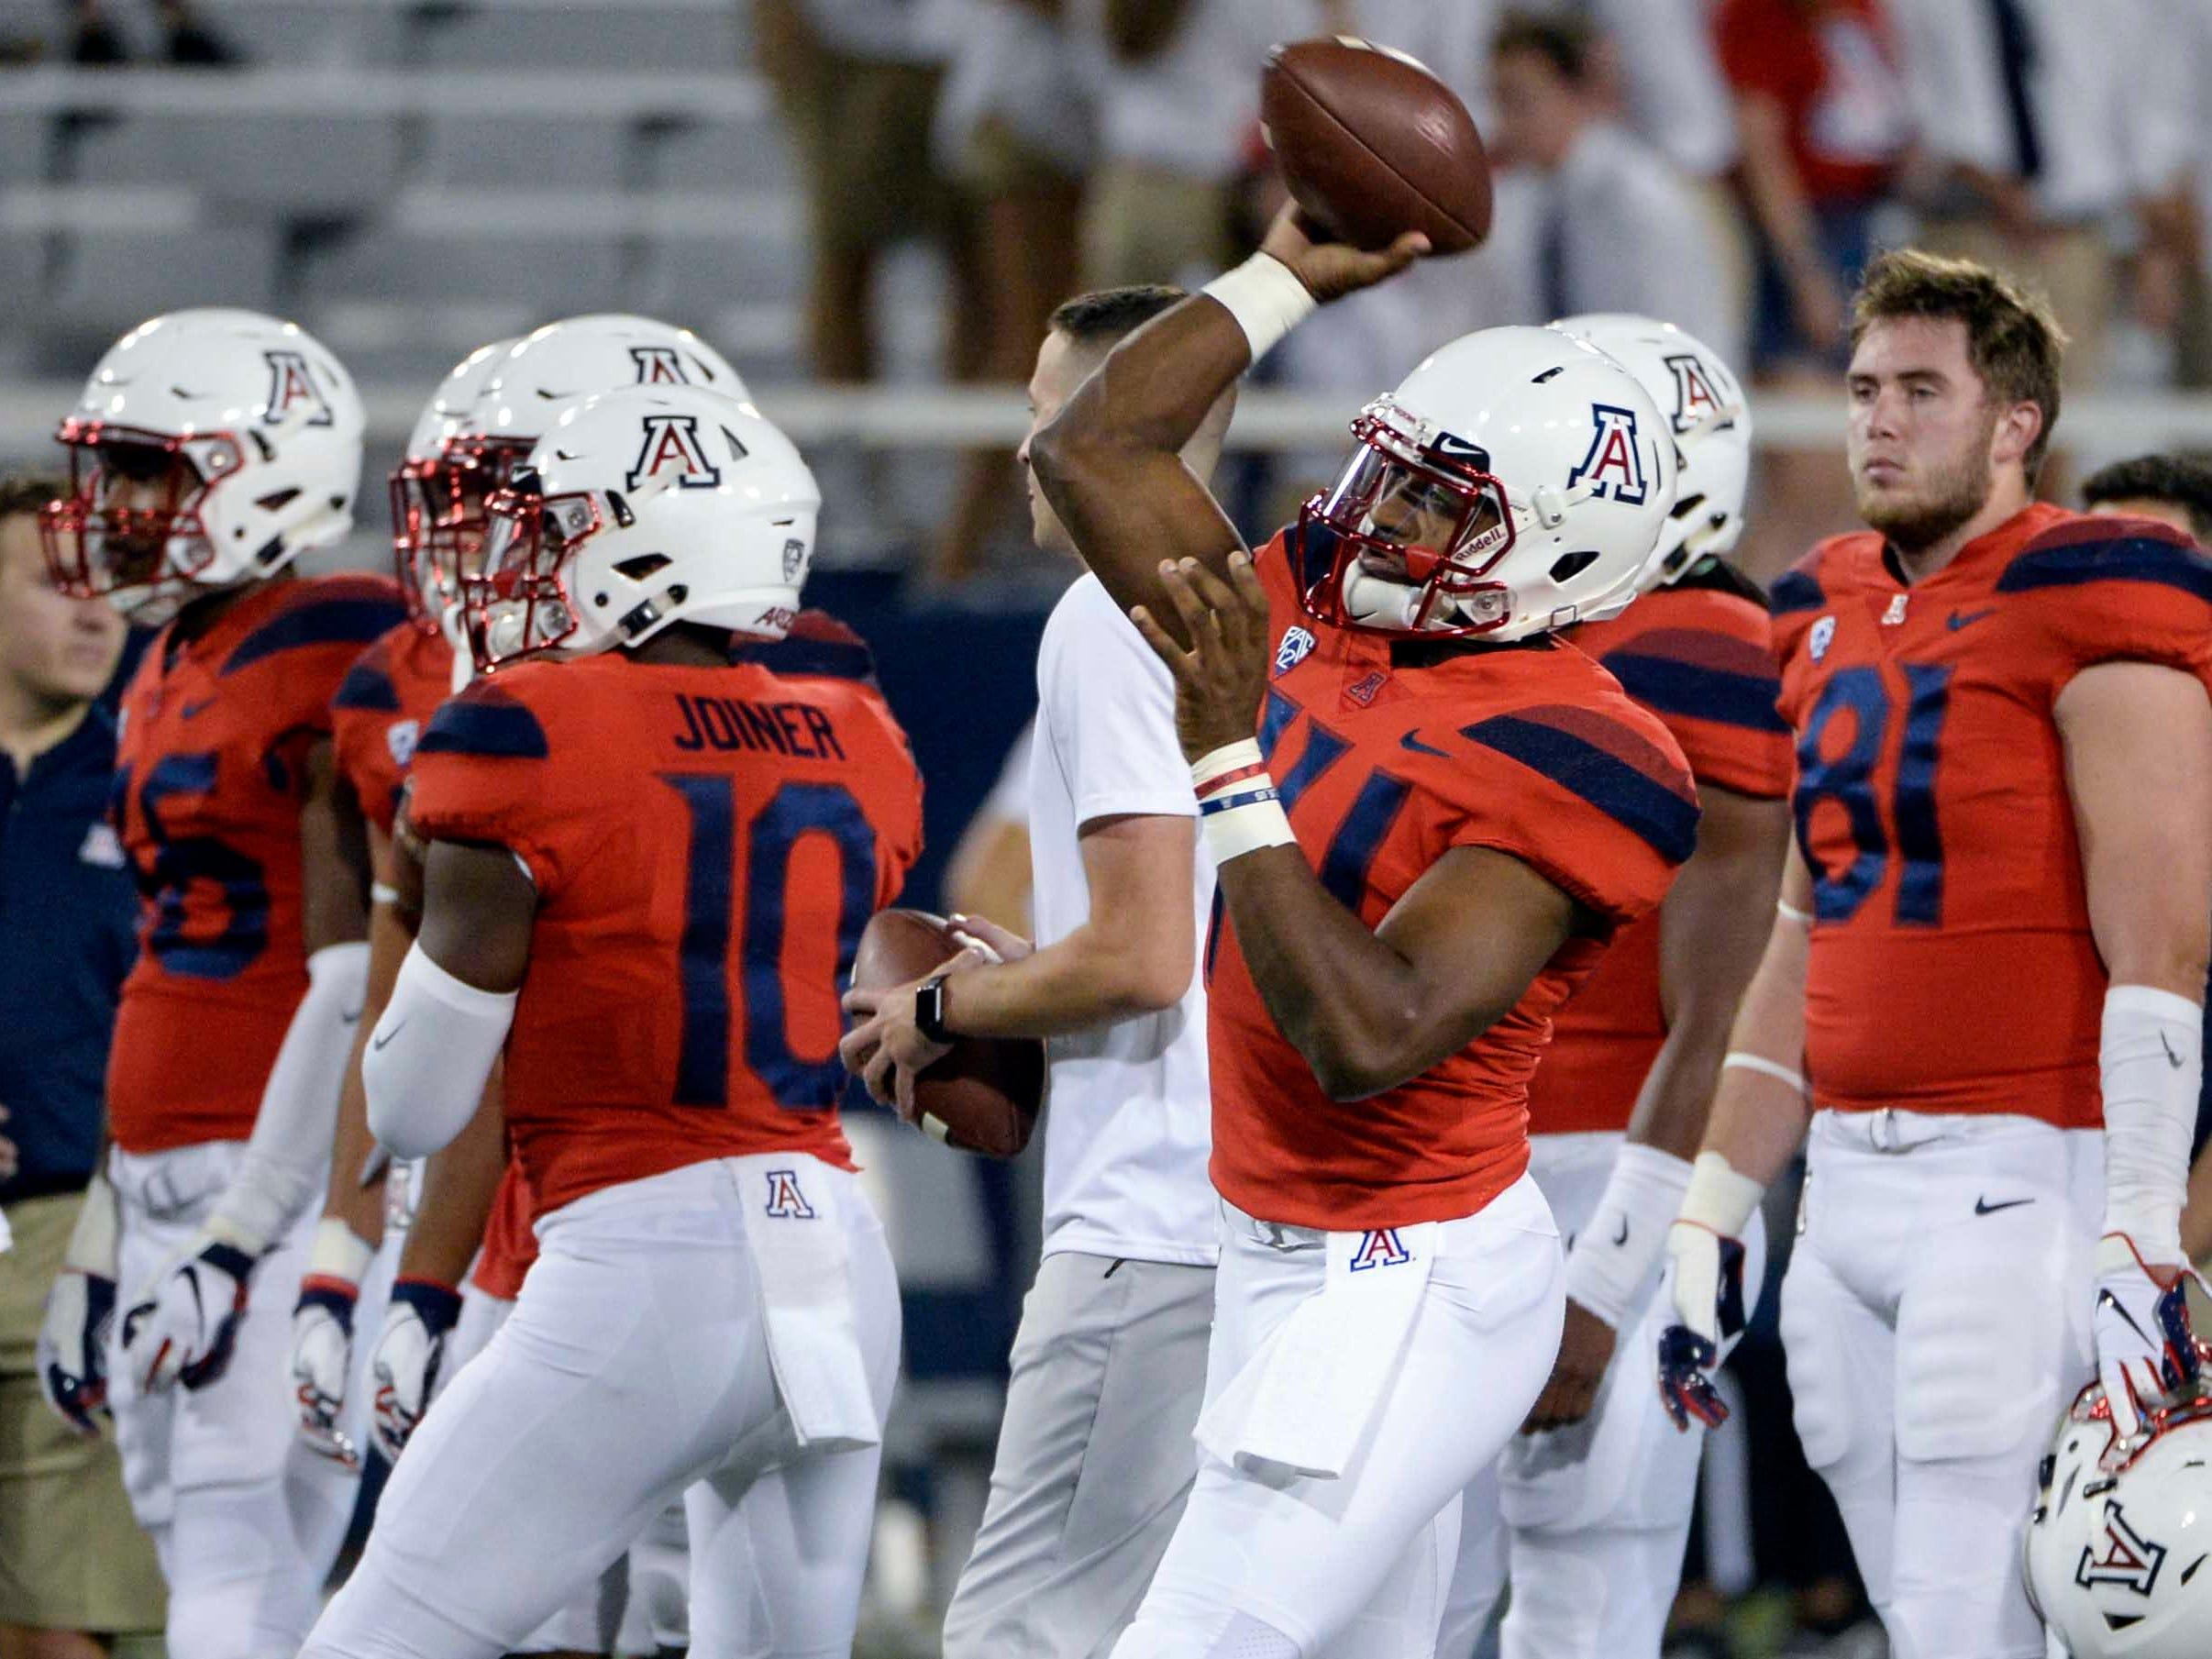 Oct 6, 2018; Tucson, AZ, USA; Arizona Wildcats quarterback Khalil Tate (14) warms up before playing the California Golden Bears at Arizona Stadium. Mandatory Credit: Casey Sapio-USA TODAY Sports